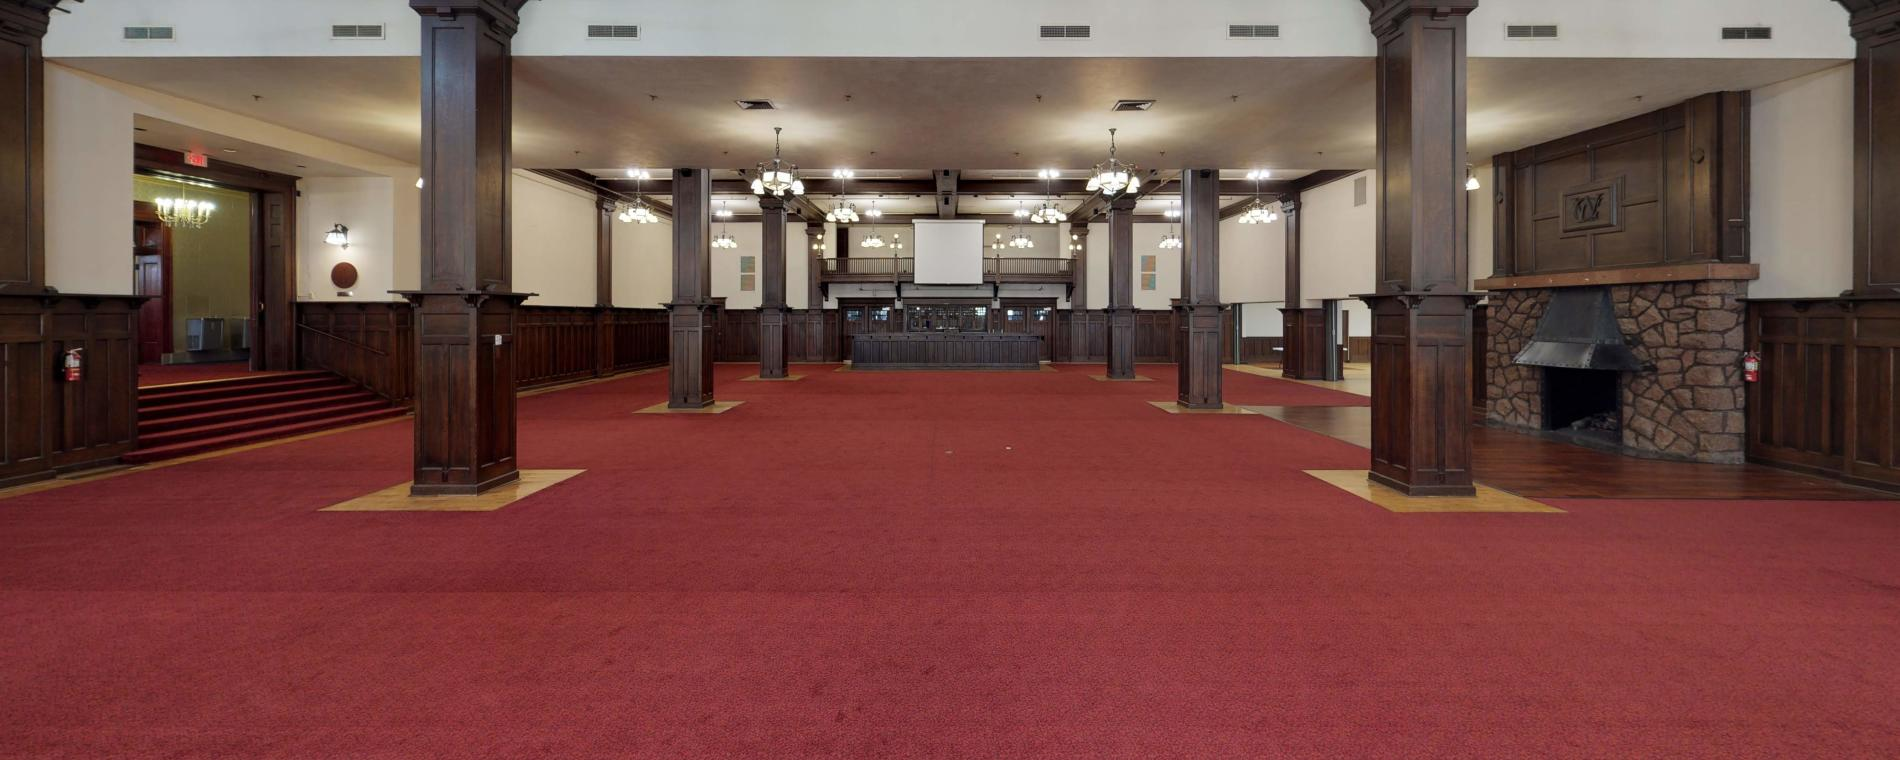 TempleLive Venue Ballroom